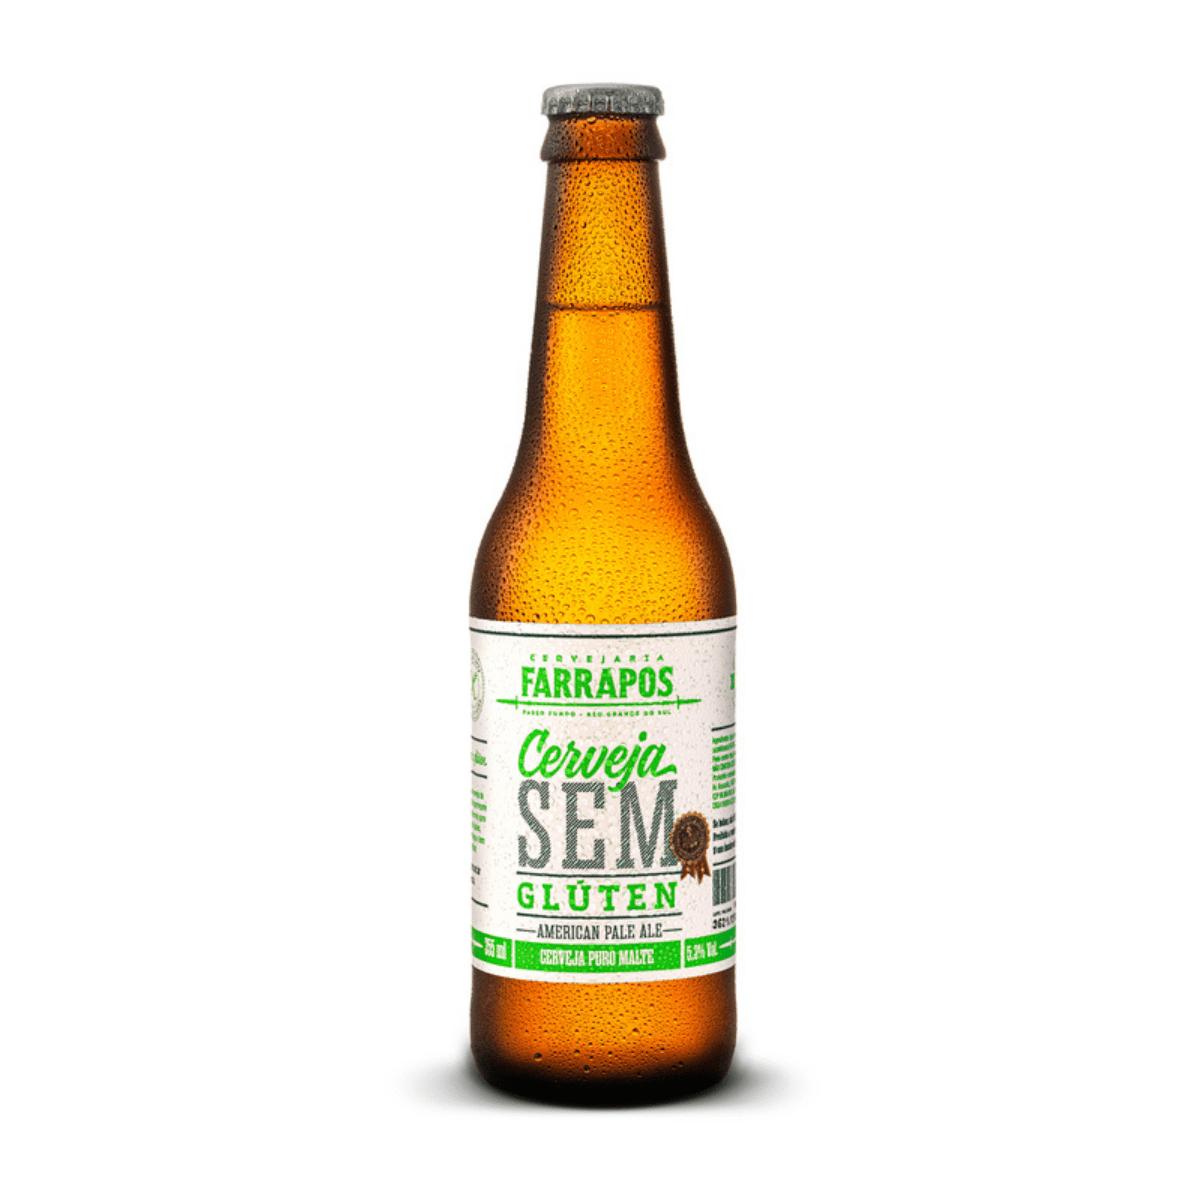 Cerveja Farrapos Sem Gluten American Pale Ale APA 355 ml